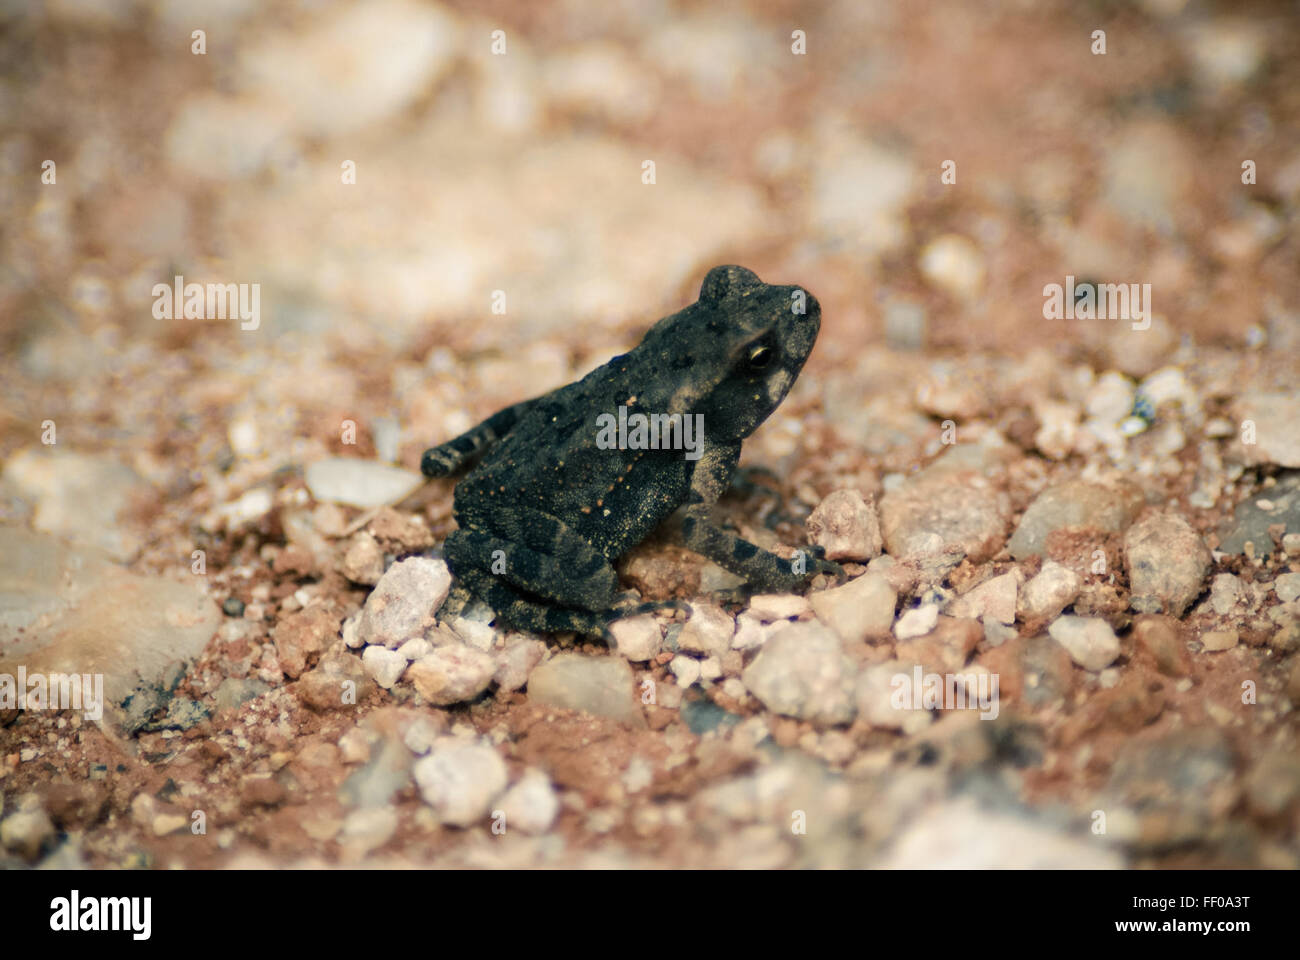 Anura Frog Herpetology Toad Zoology amphibian animal focus - Stock Image